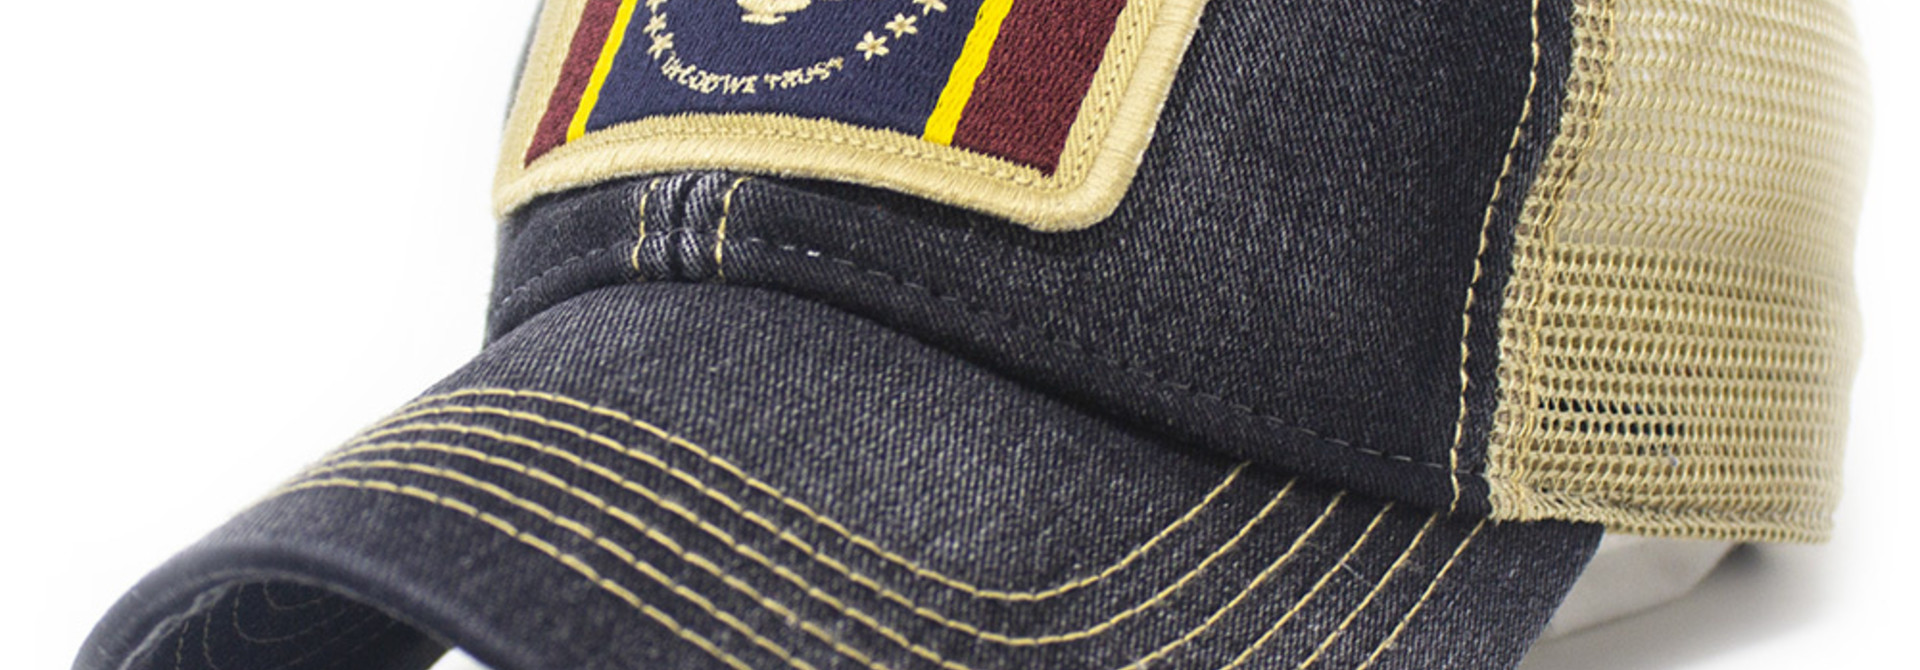 "Mississippi ""In God We Trust"" Flag Patch Trucker Hat, Black"